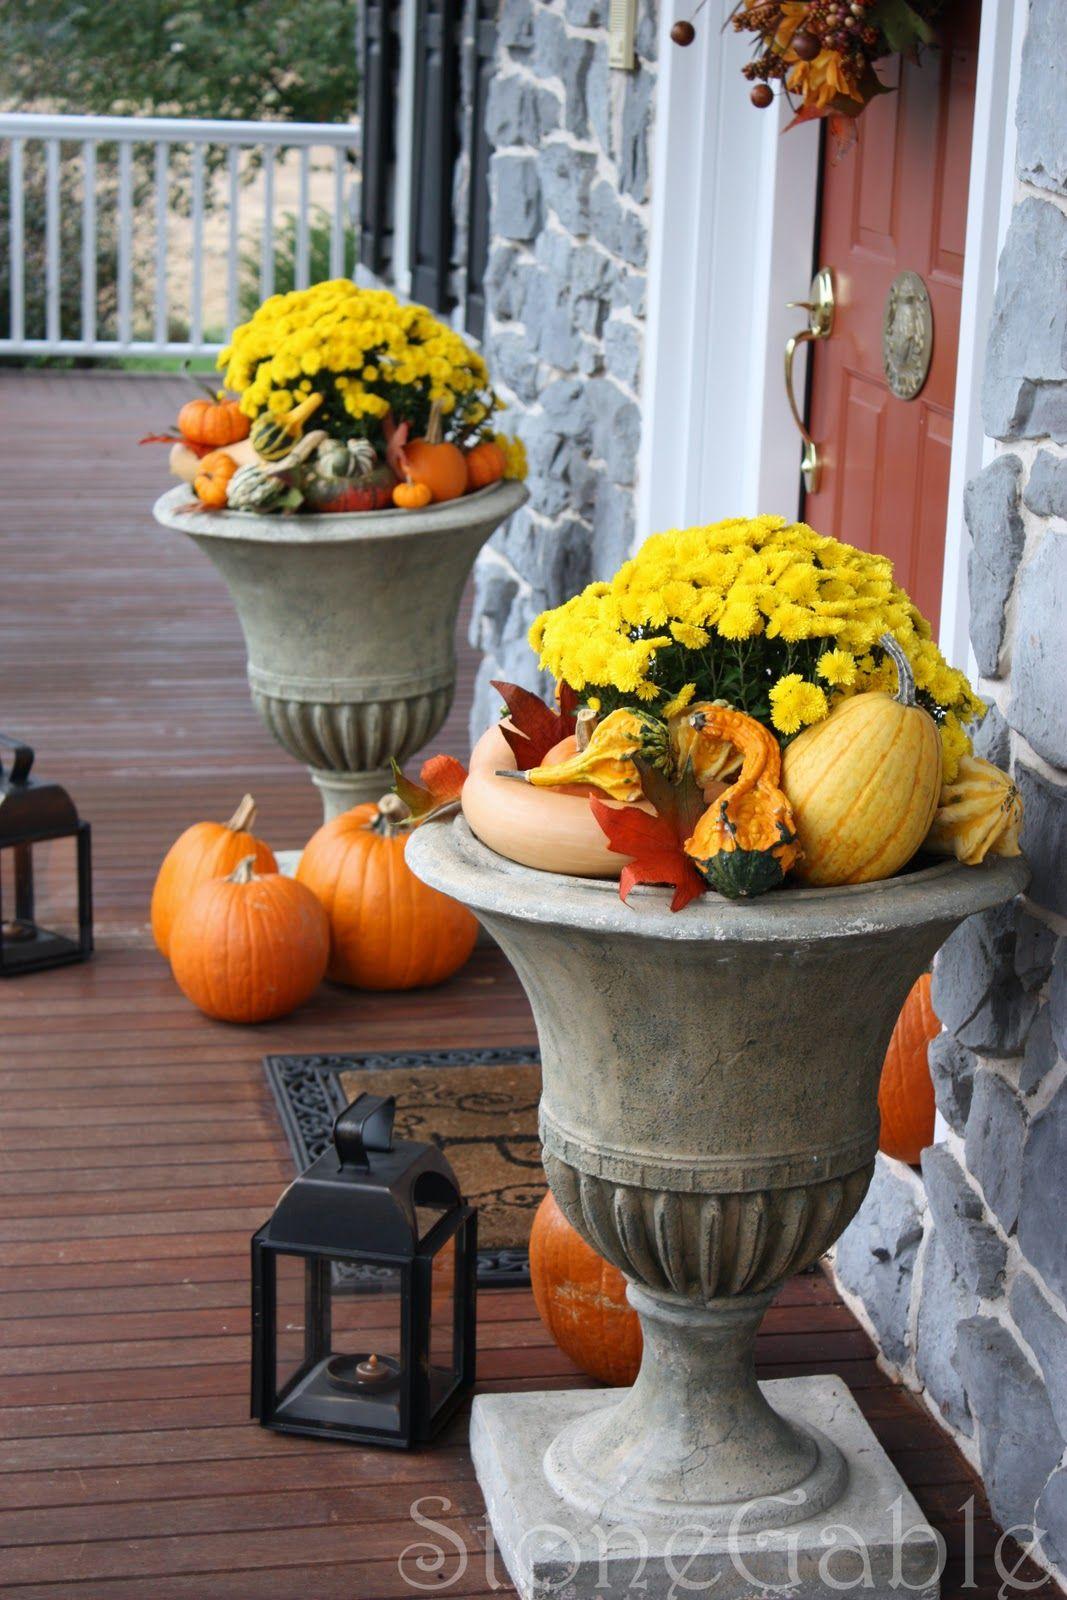 Outdoor Fall Decor Fall Decor Autumn Decorating Fall Deco